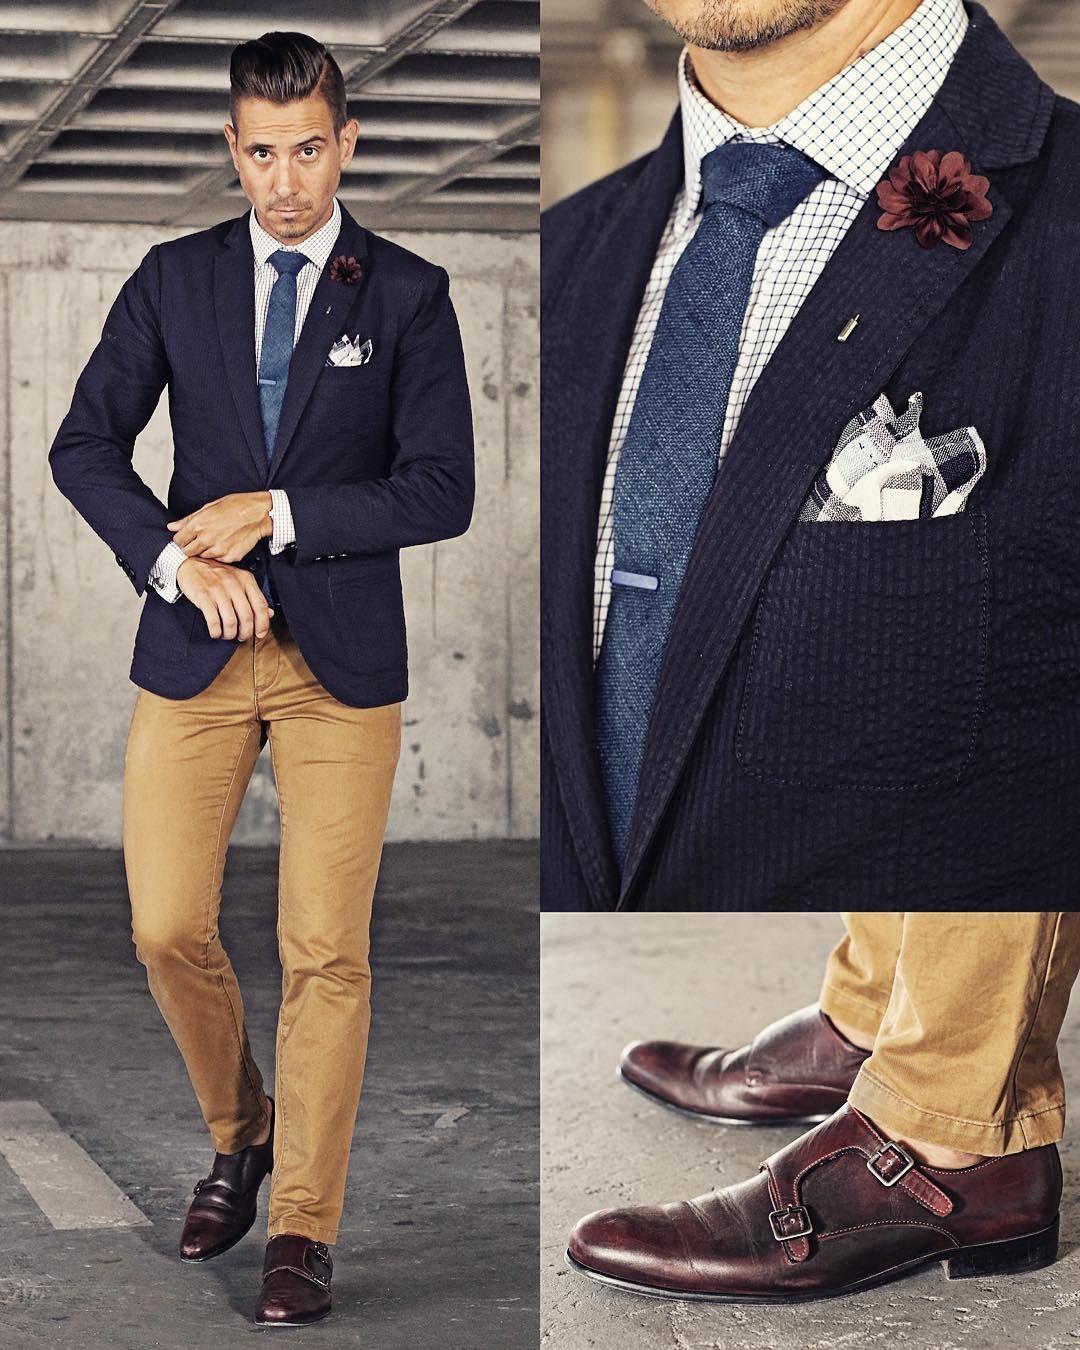 Ermenegildo Zegna - Made to Measure - Perfectly tailored Jacket for ...